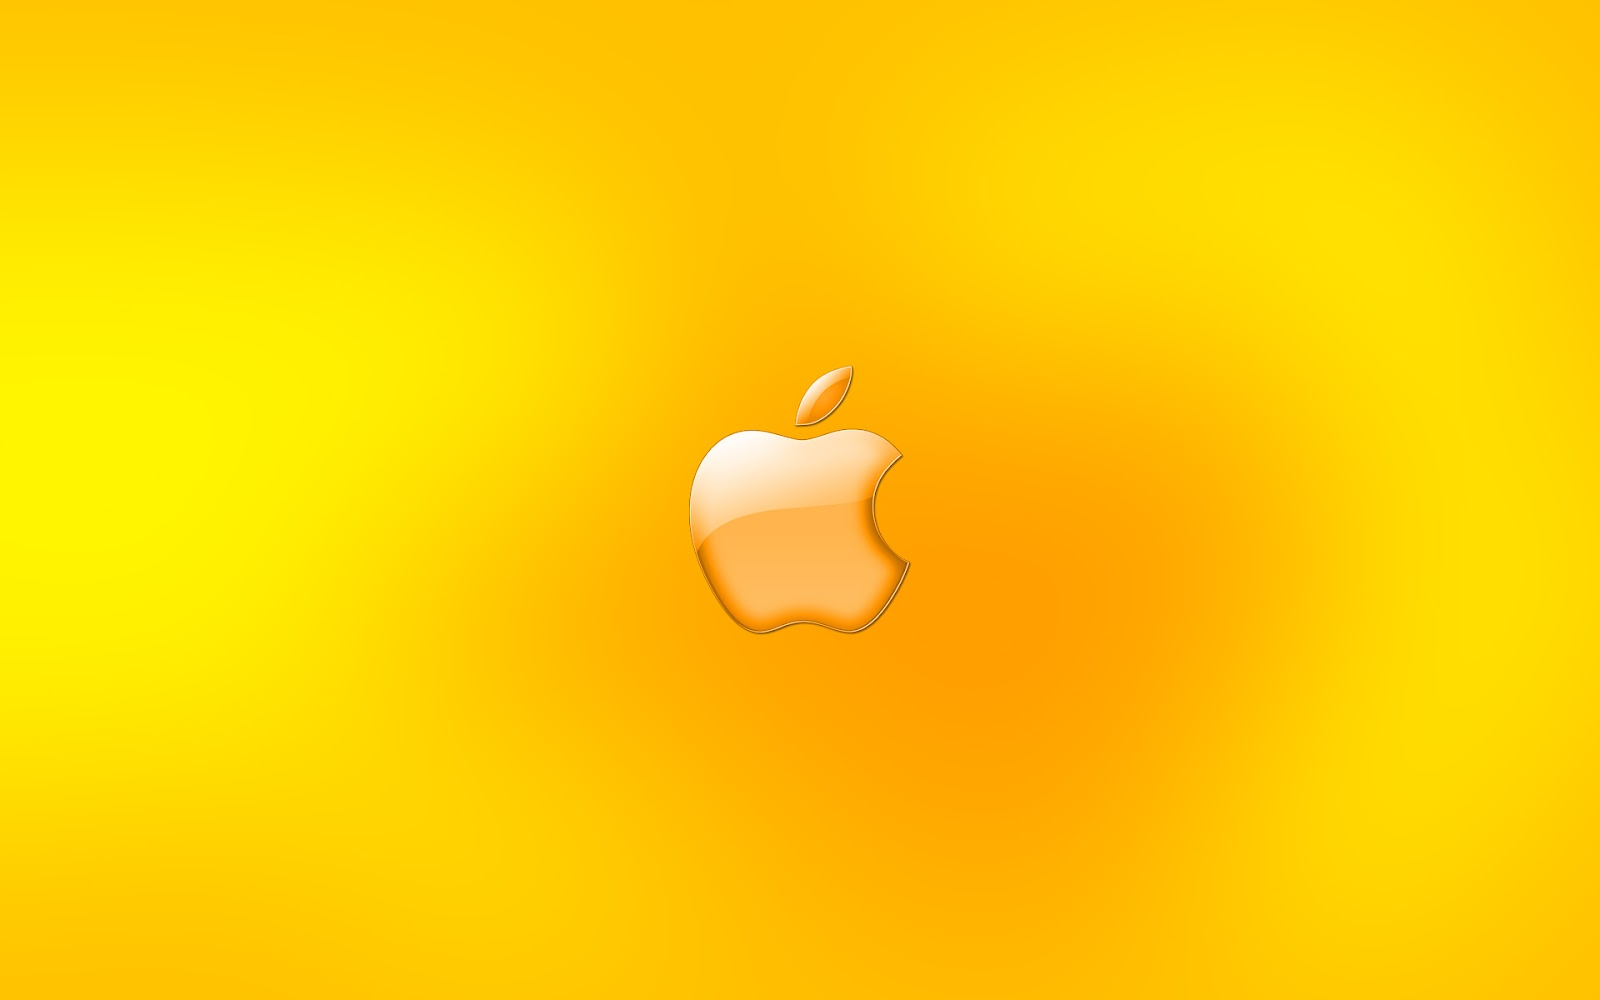 Wallpaper computer macs | yellow apple | ART TWO